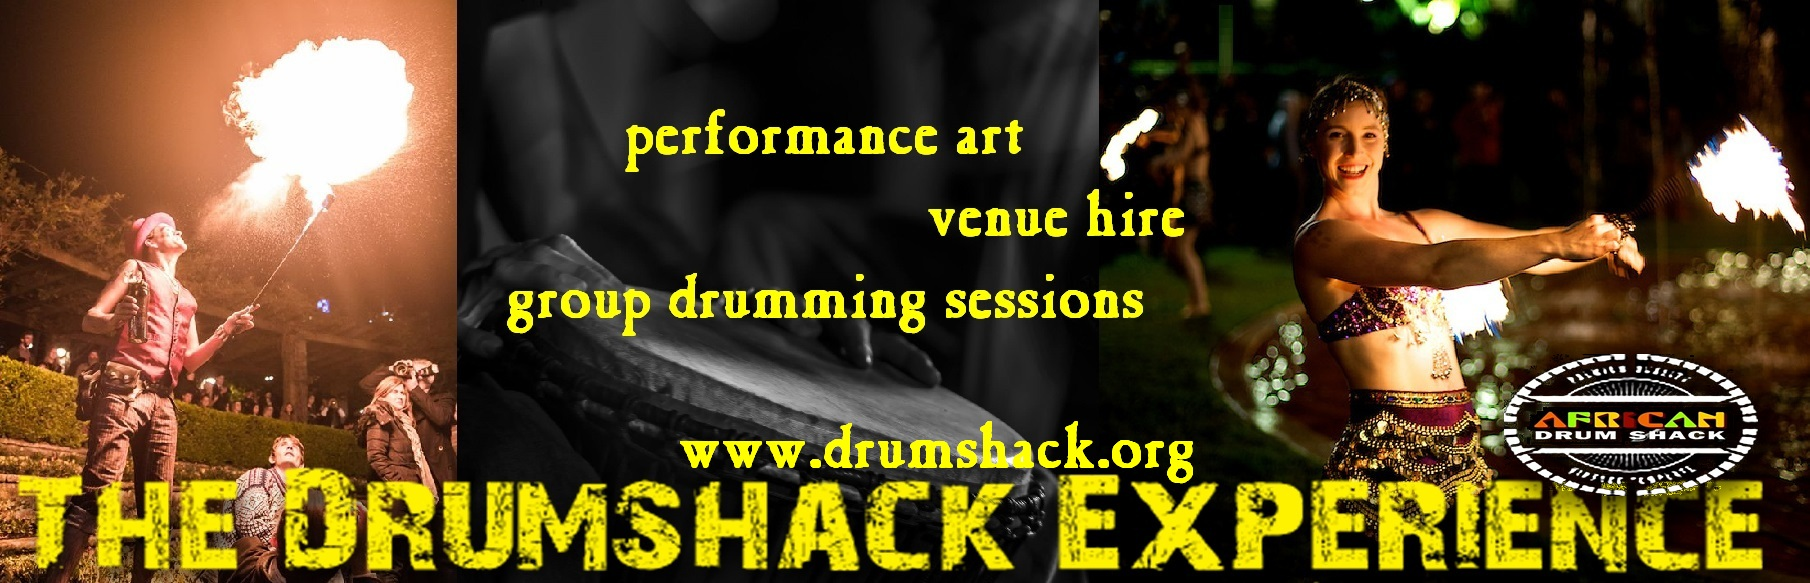 drumshack banner 01jpg